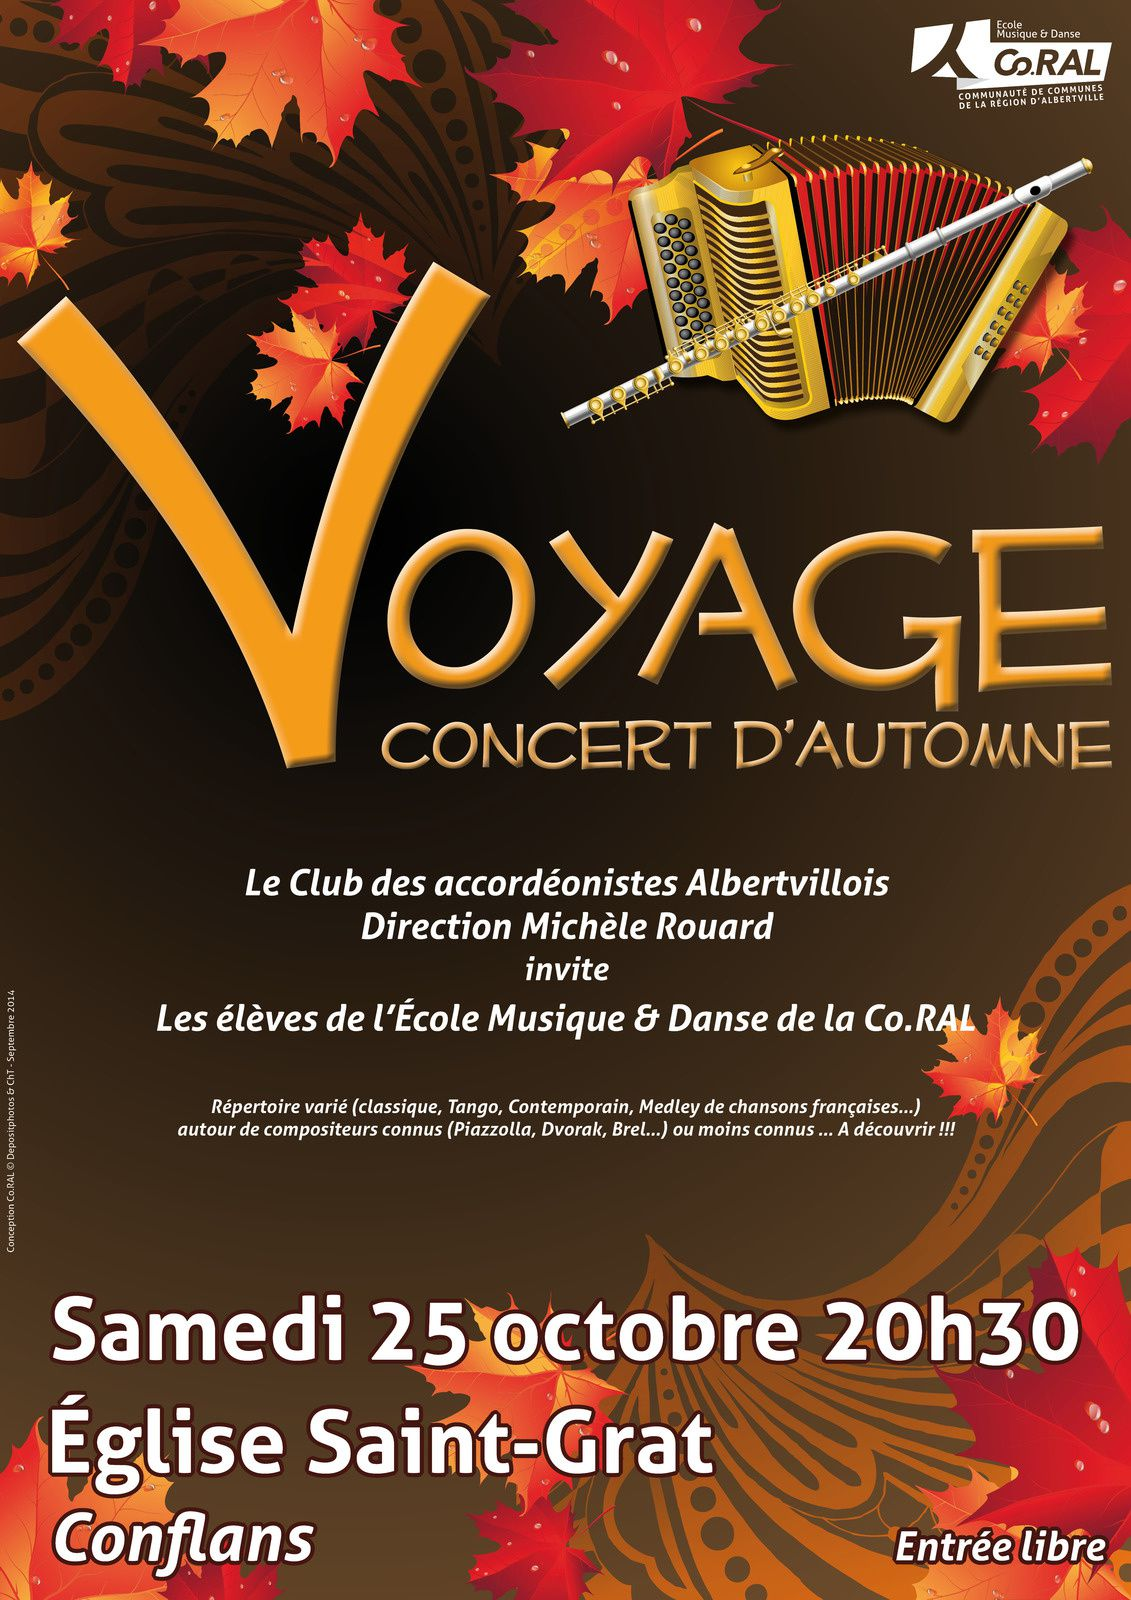 Concert le 25 octobre